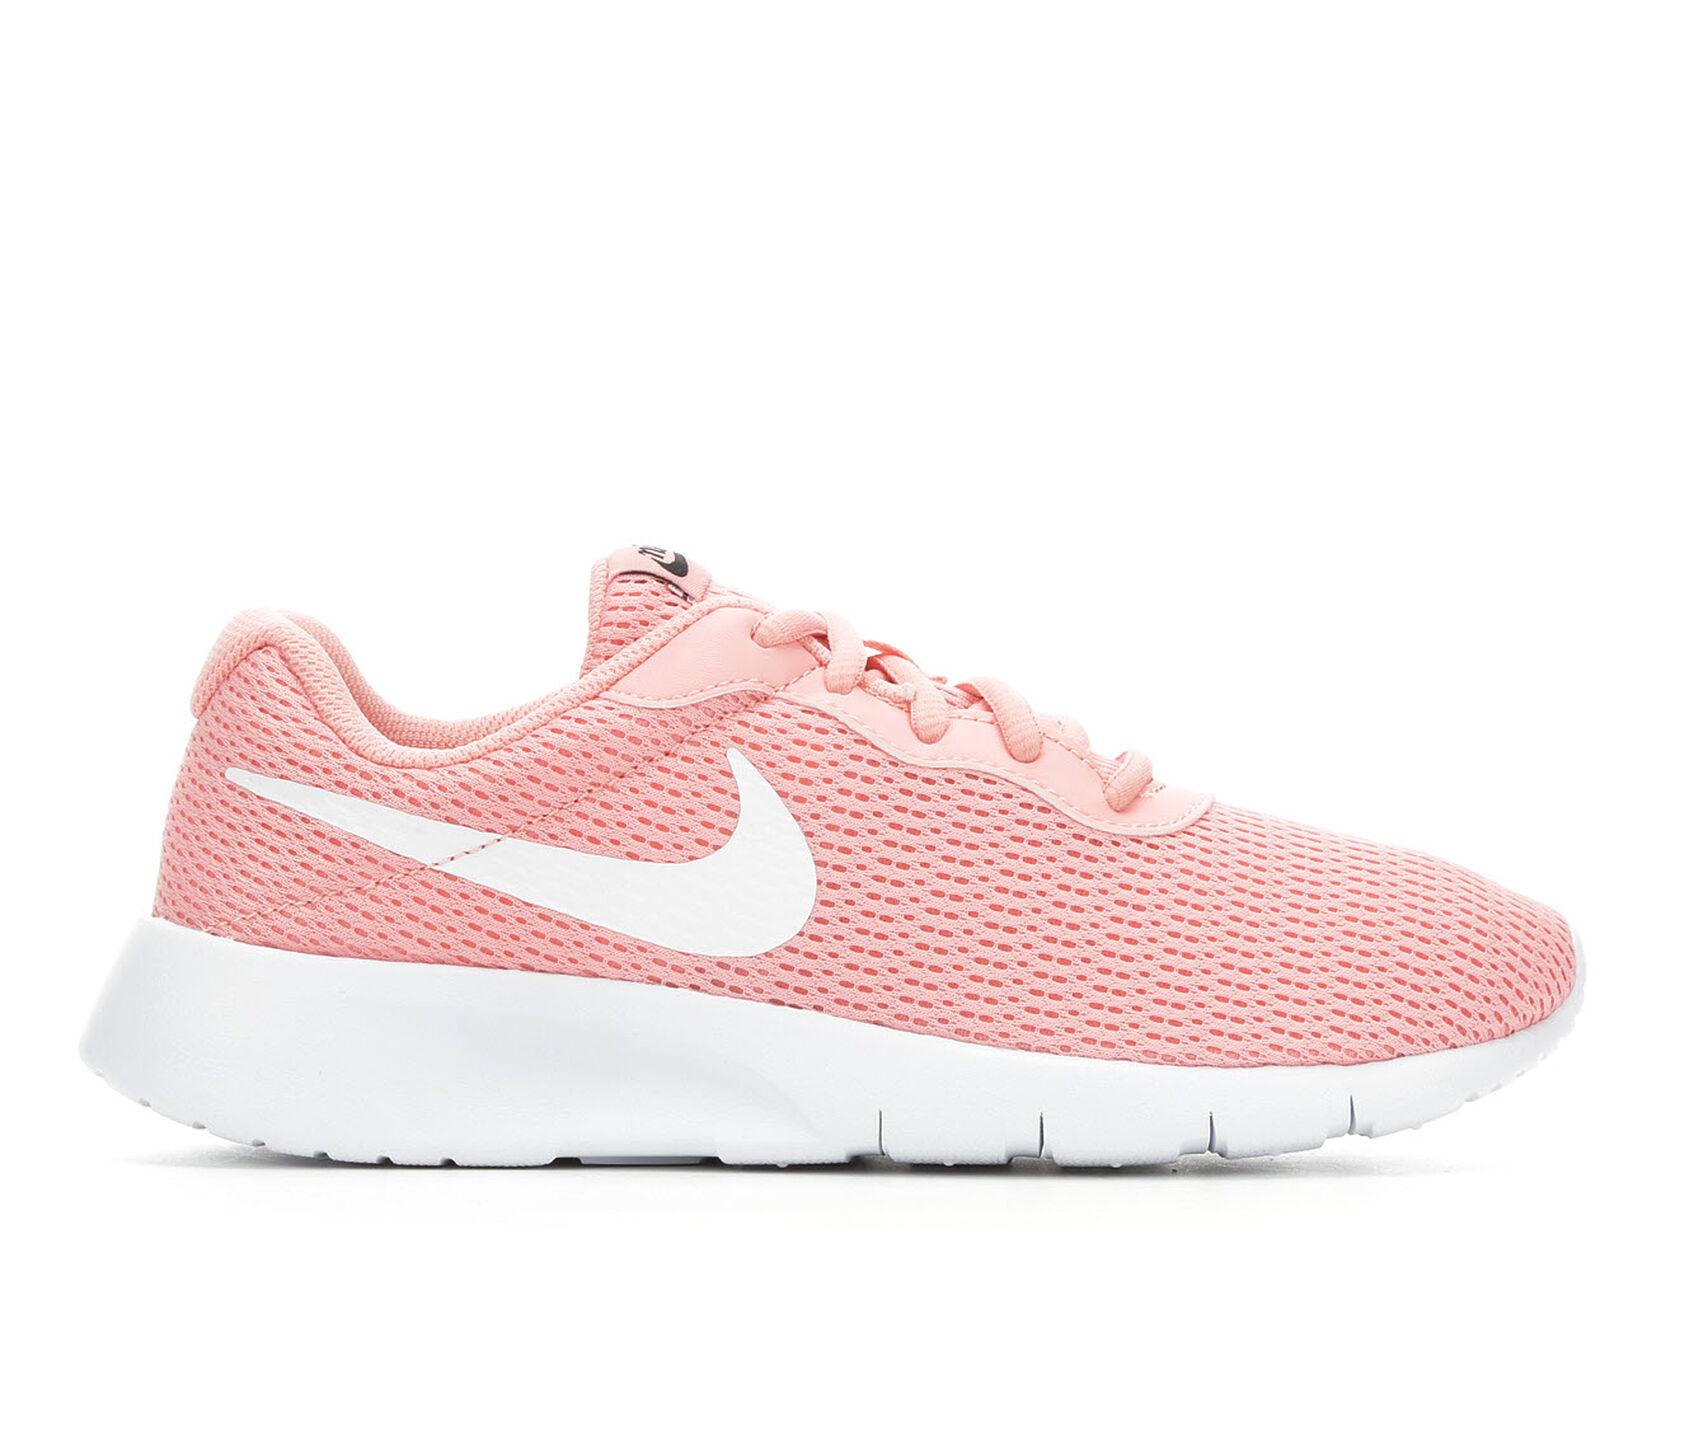 a881ddd334 Girls' Nike Big Kid Tanjun Sneakers | Shoe Carnival